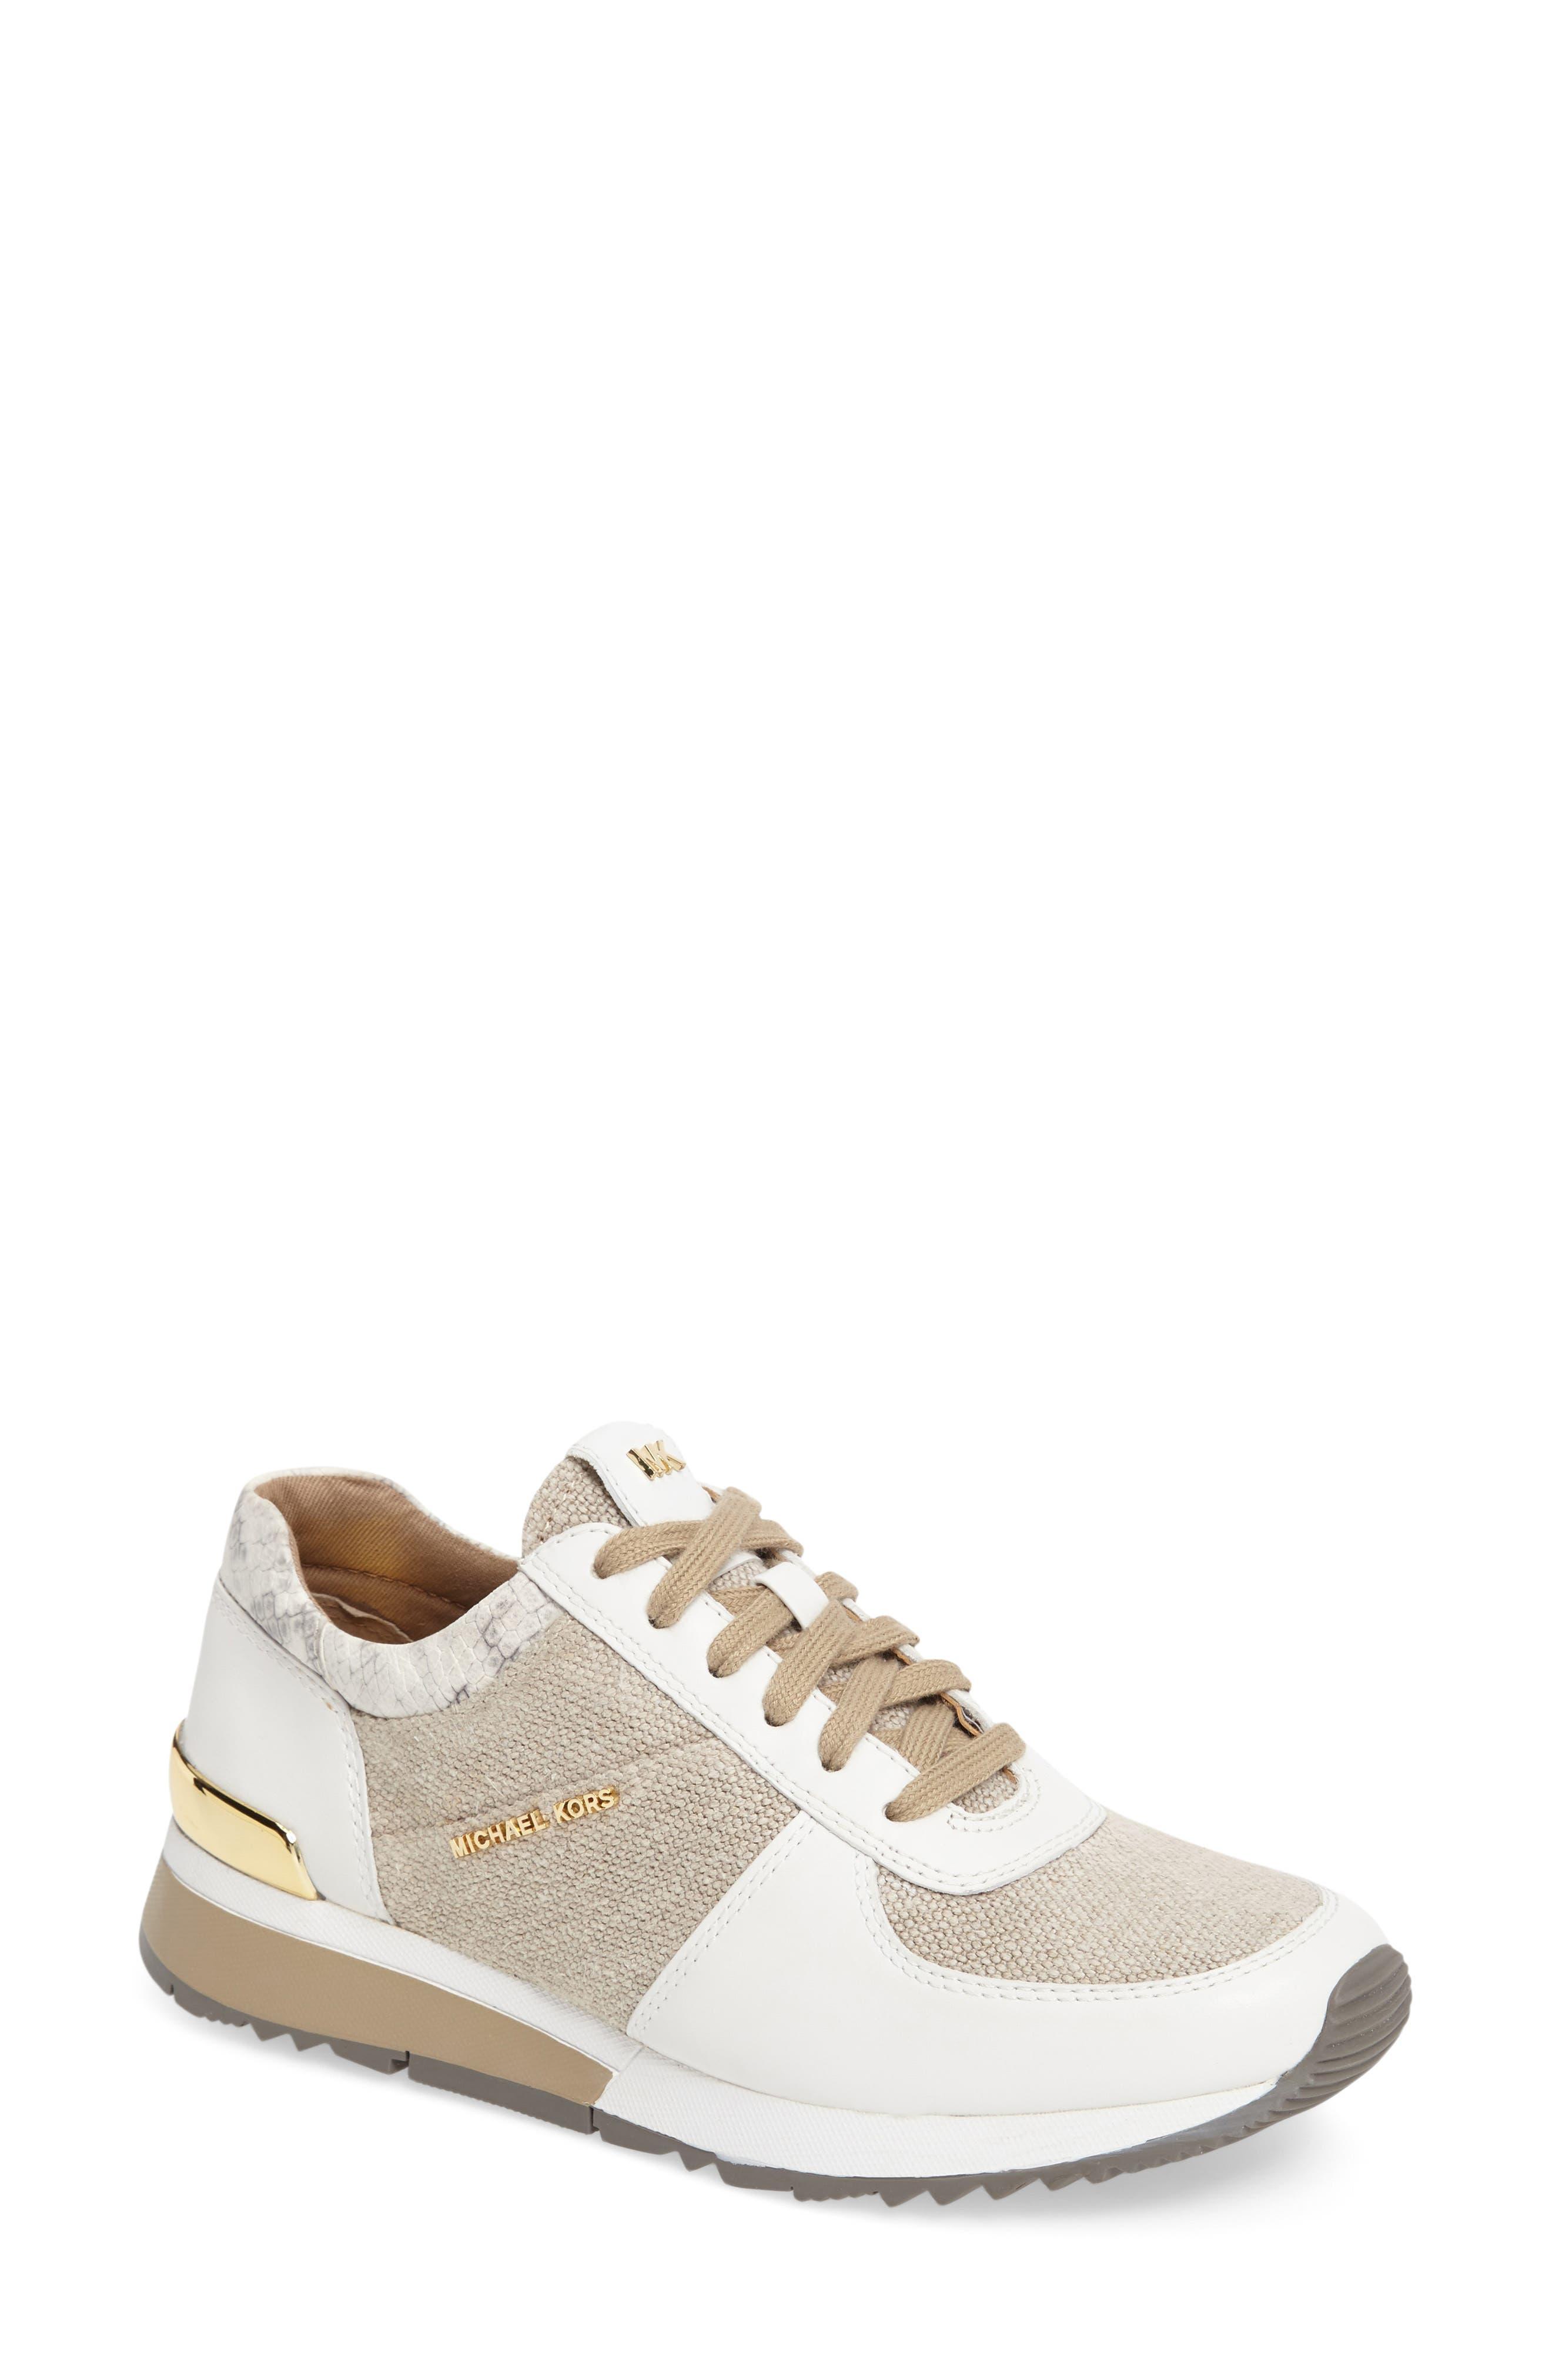 Alternate Image 1 Selected - MICHAEL Michael Kors 'Allie' Sneaker (Women)